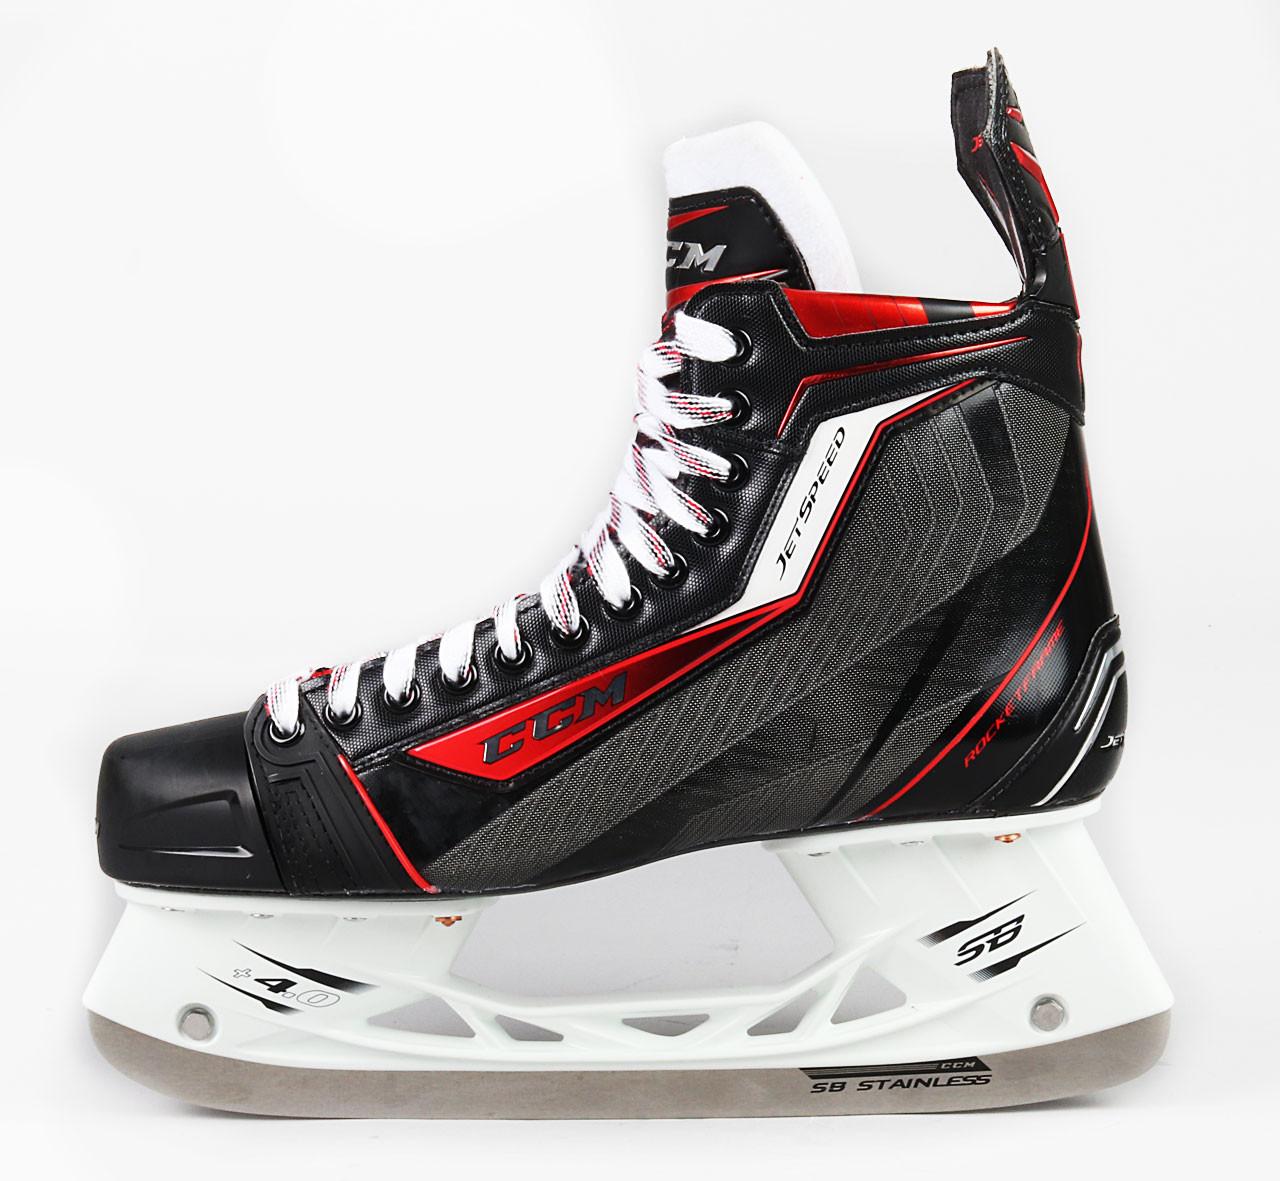 Size 11 5 / 11 5 - CCM Jetspeed Pro Skates - Team Stock